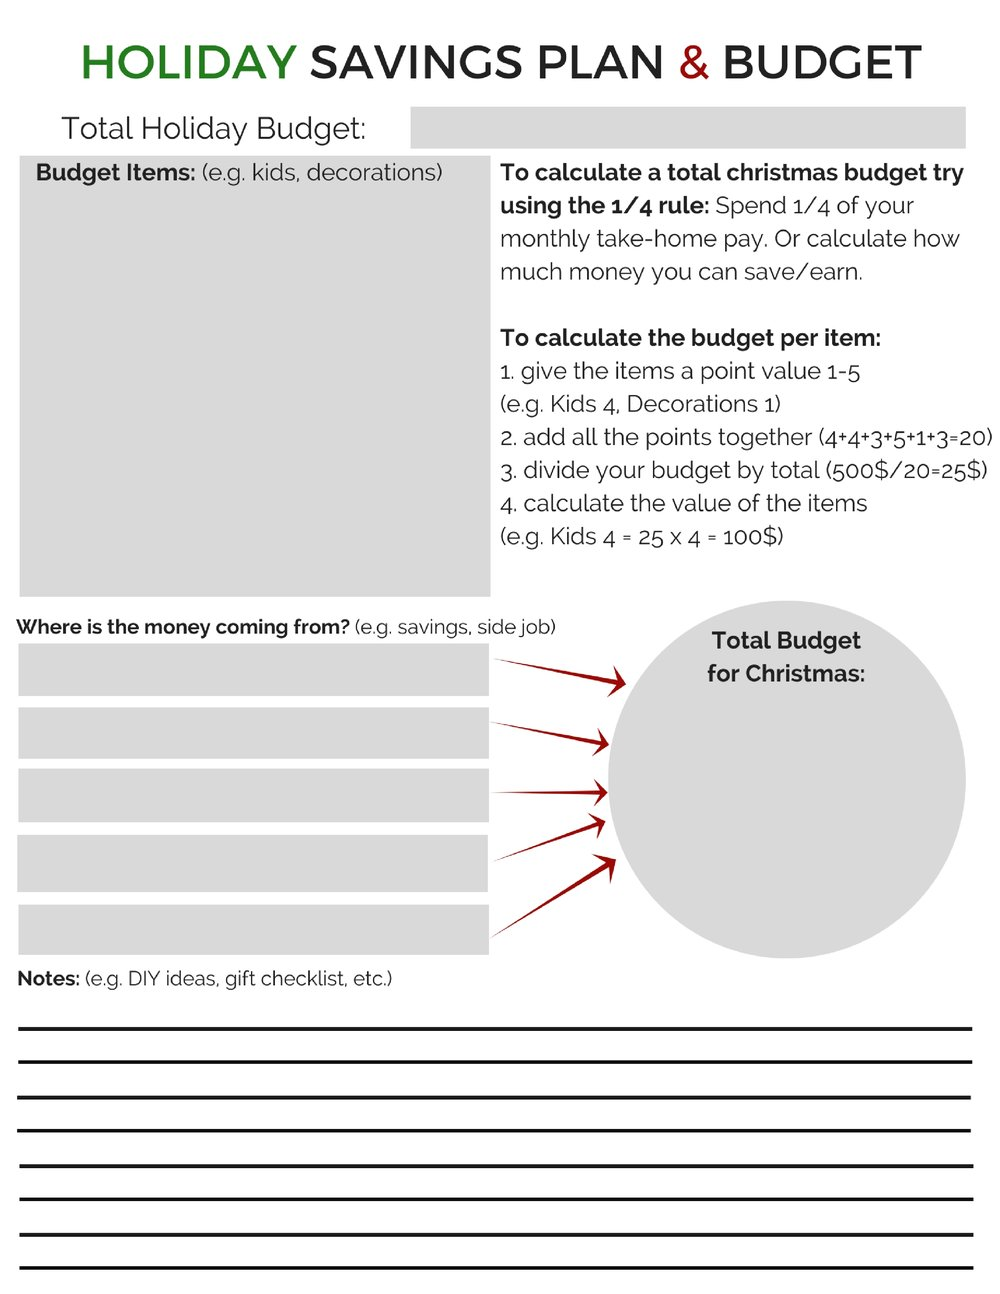 christmas savings plan & budget.jpg